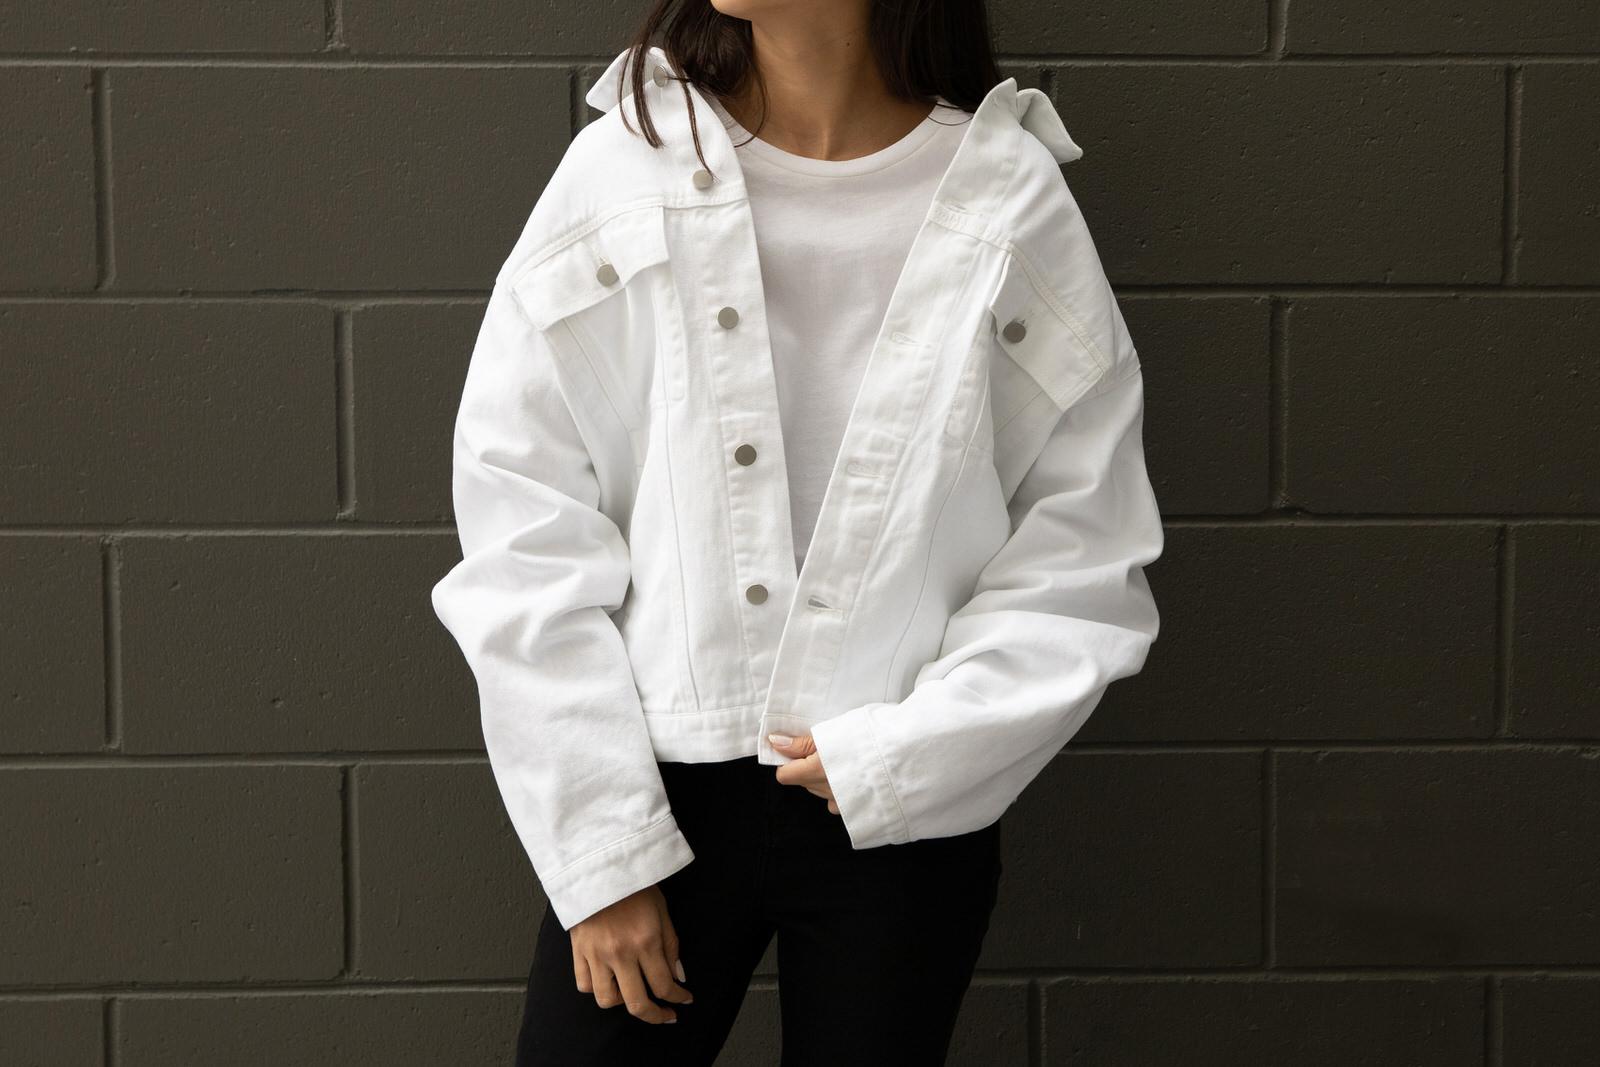 Modern women's denim jackets